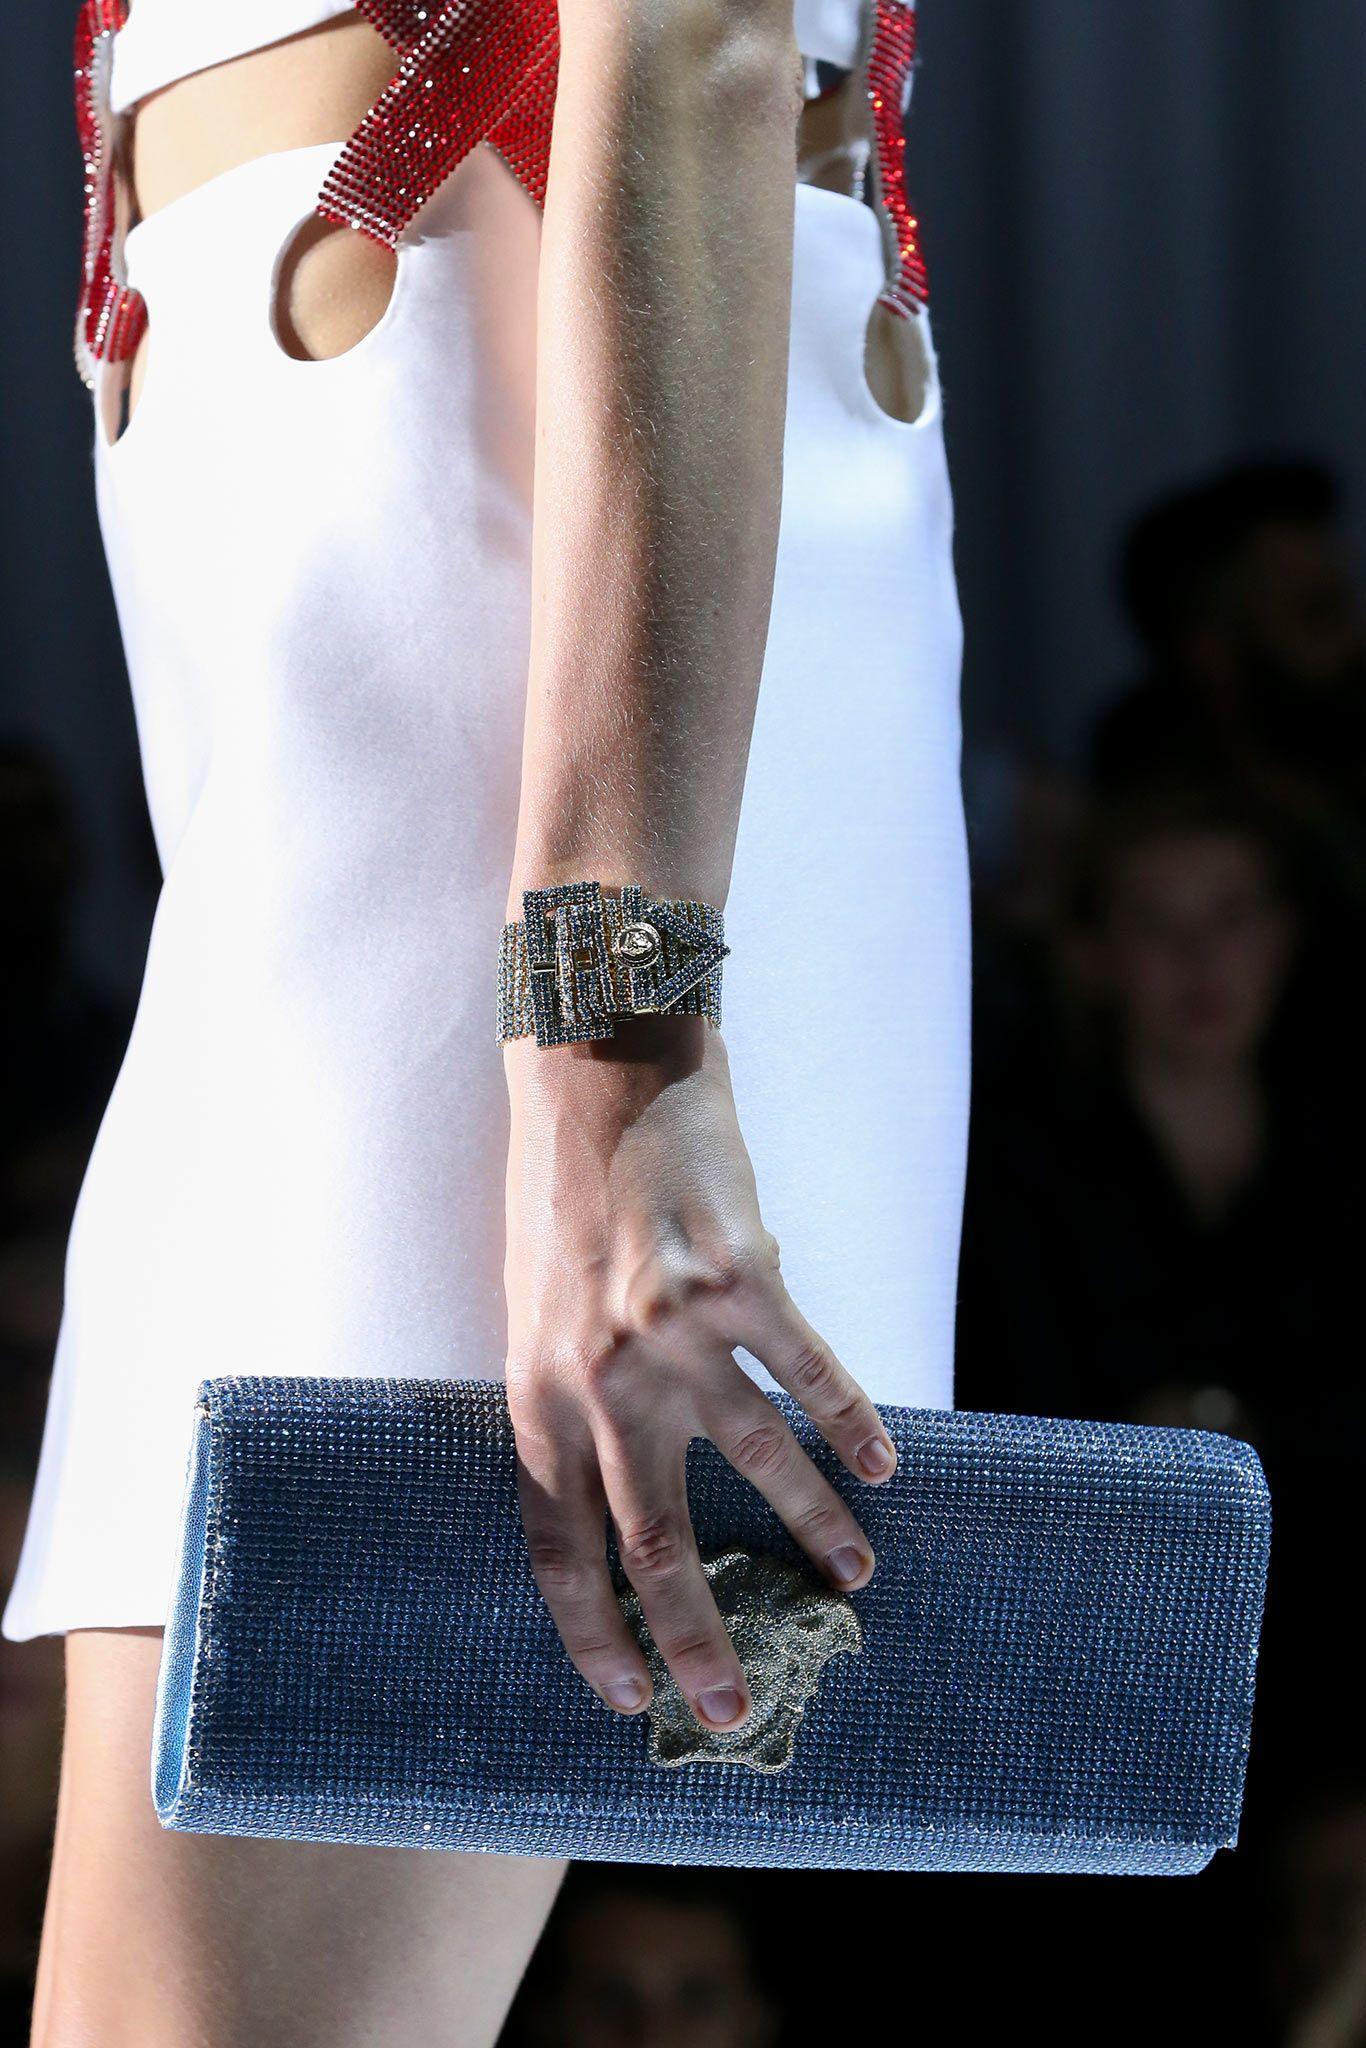 #acessorio #bolsa #accessory #purse #handbag #versace #spring2015RTW